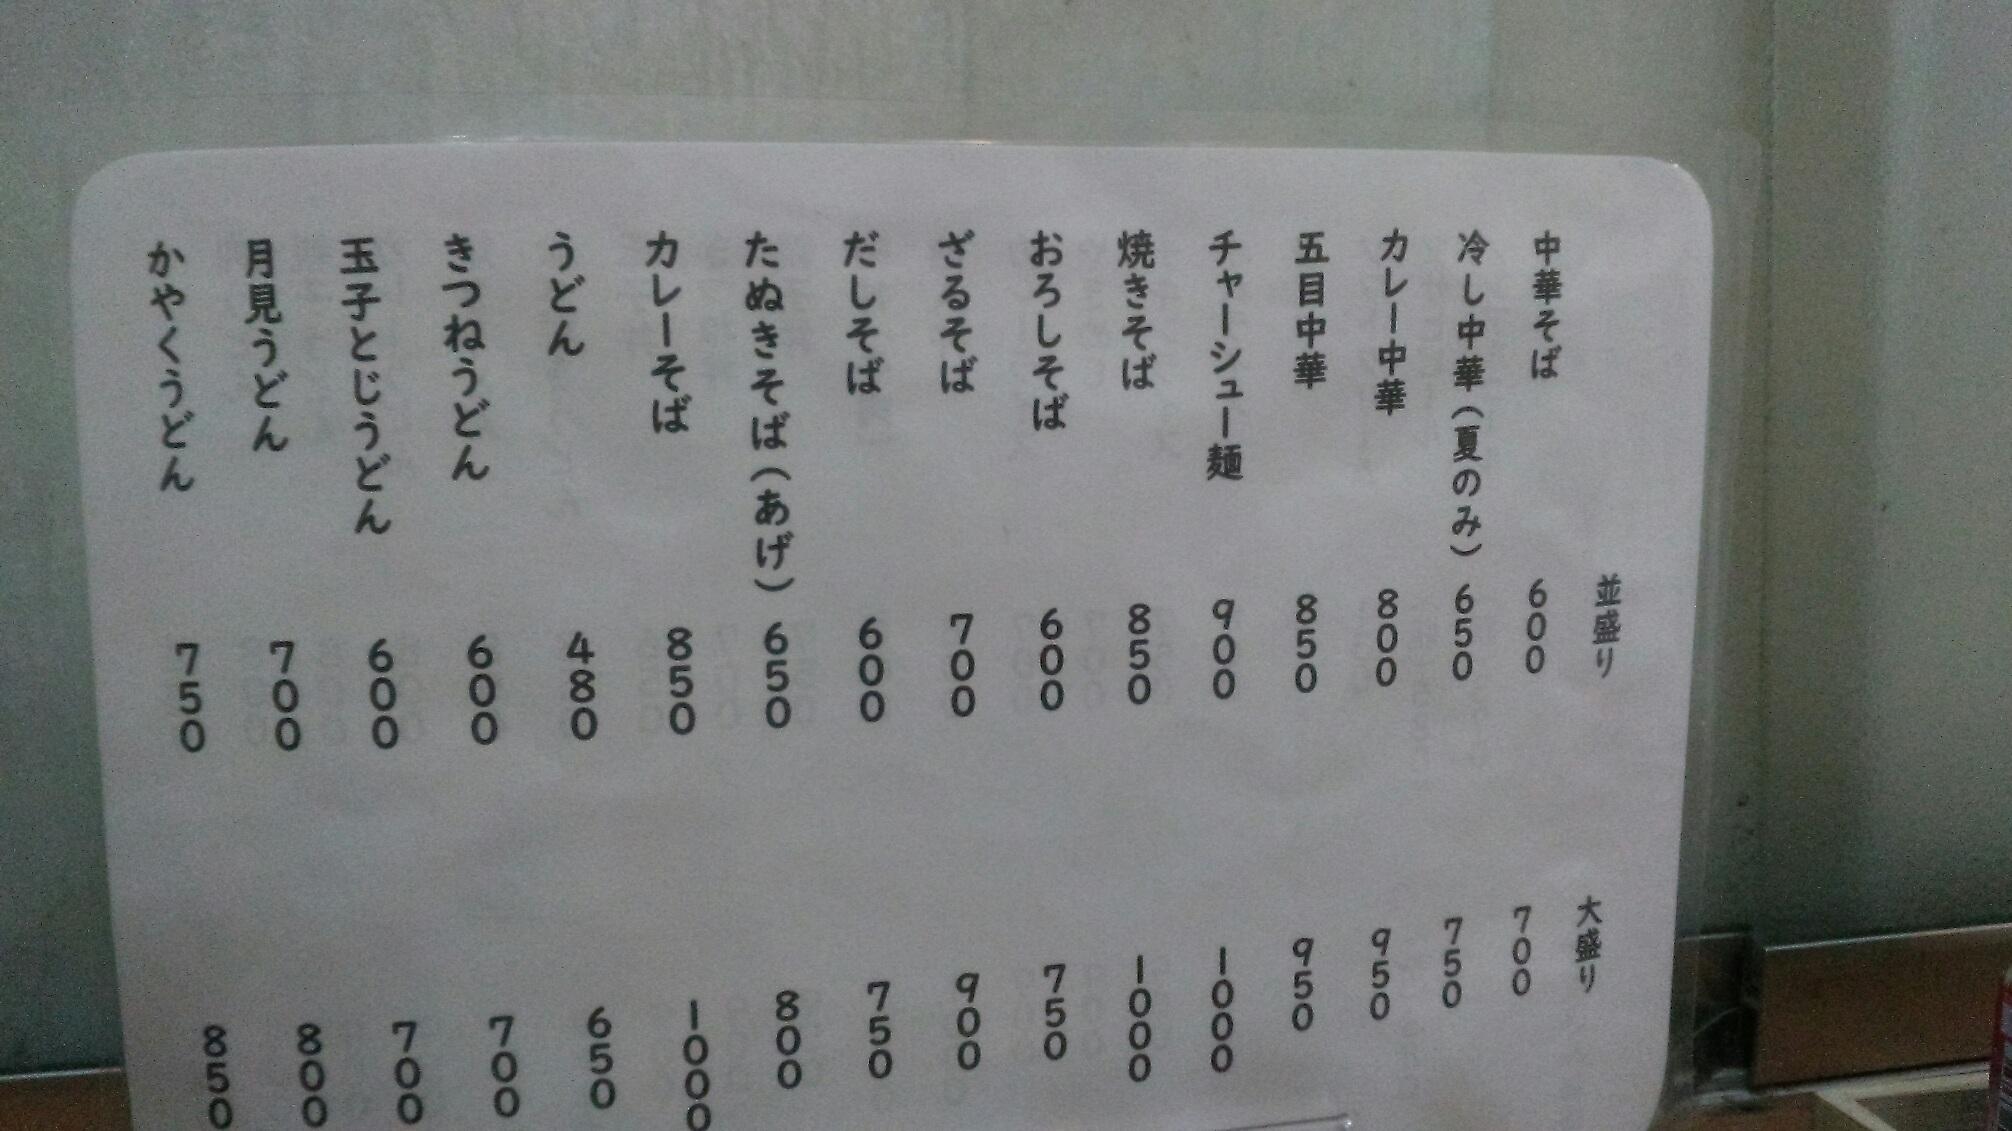 KIMG0324.jpg